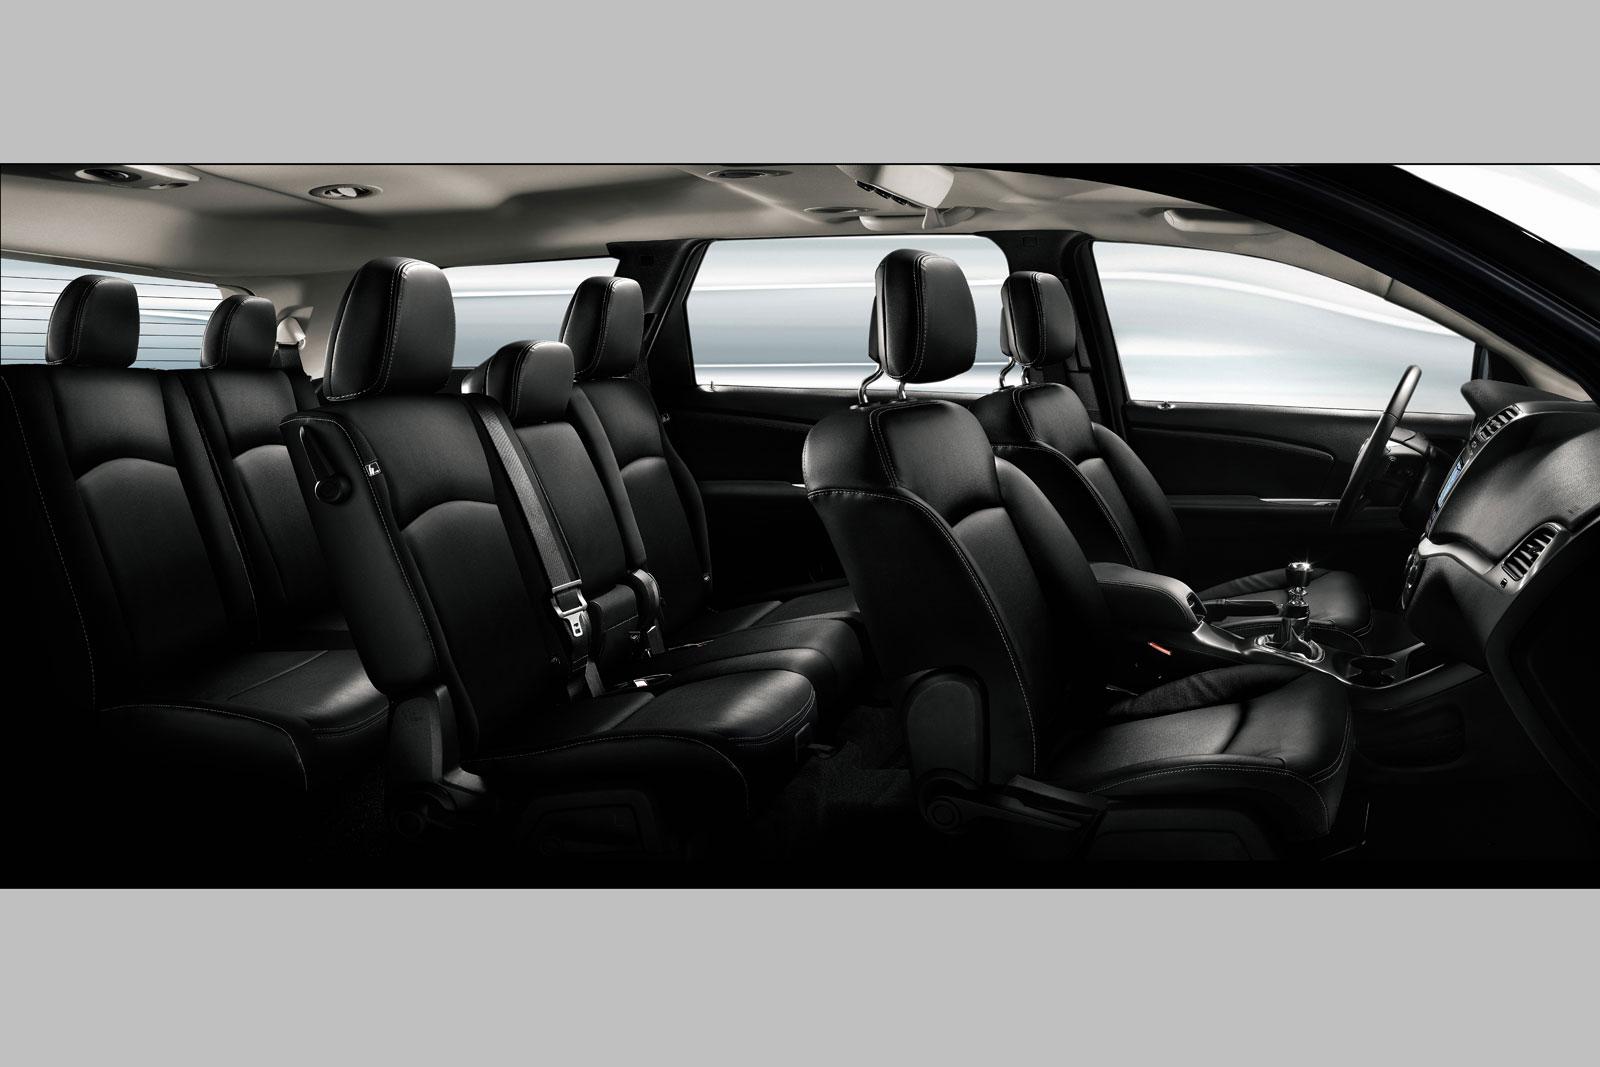 Fiat Jeep Freemont Dodge Journey A Good Idea Fiat Groups World